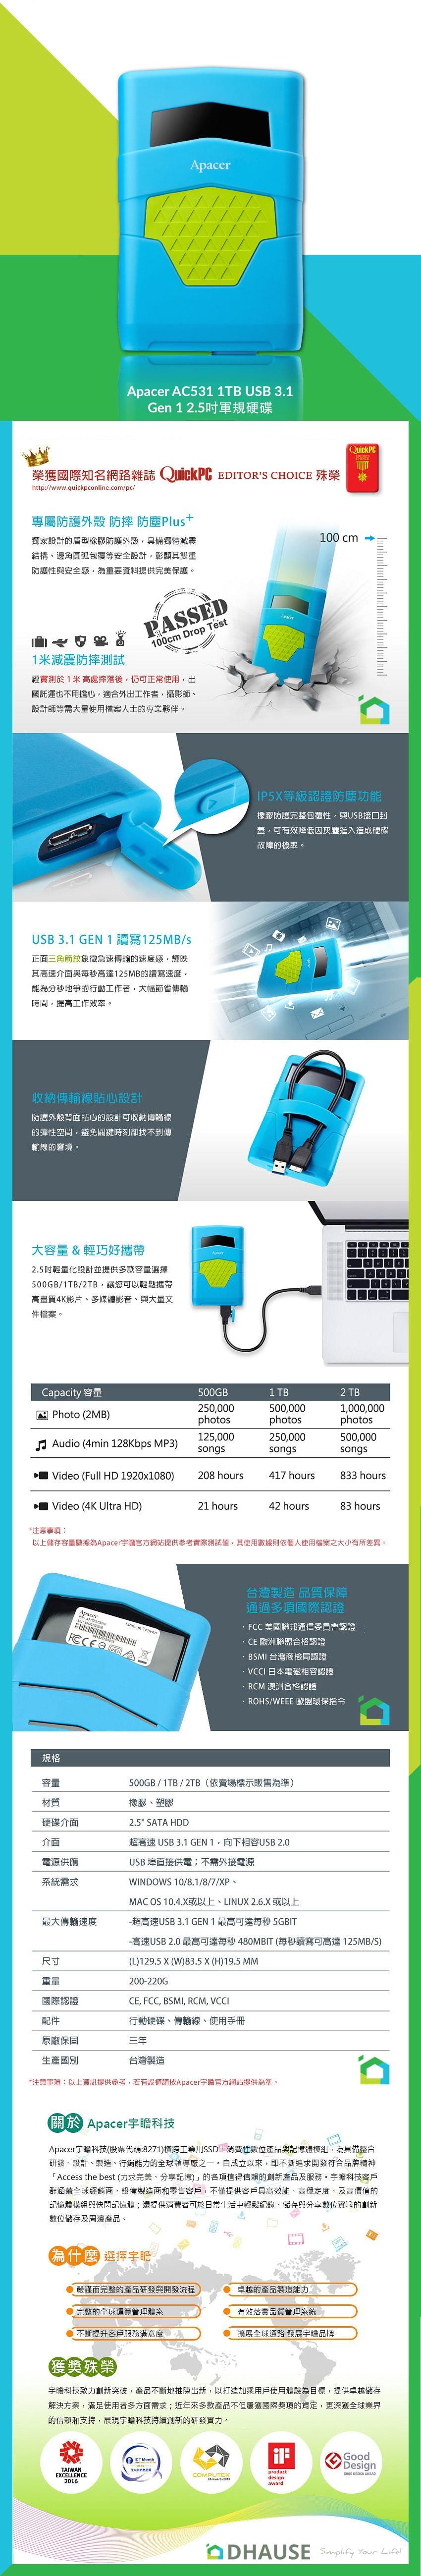 Apacer Portable Hard Drive AC531 1TB USB 3.1 Gen 1 2.5'